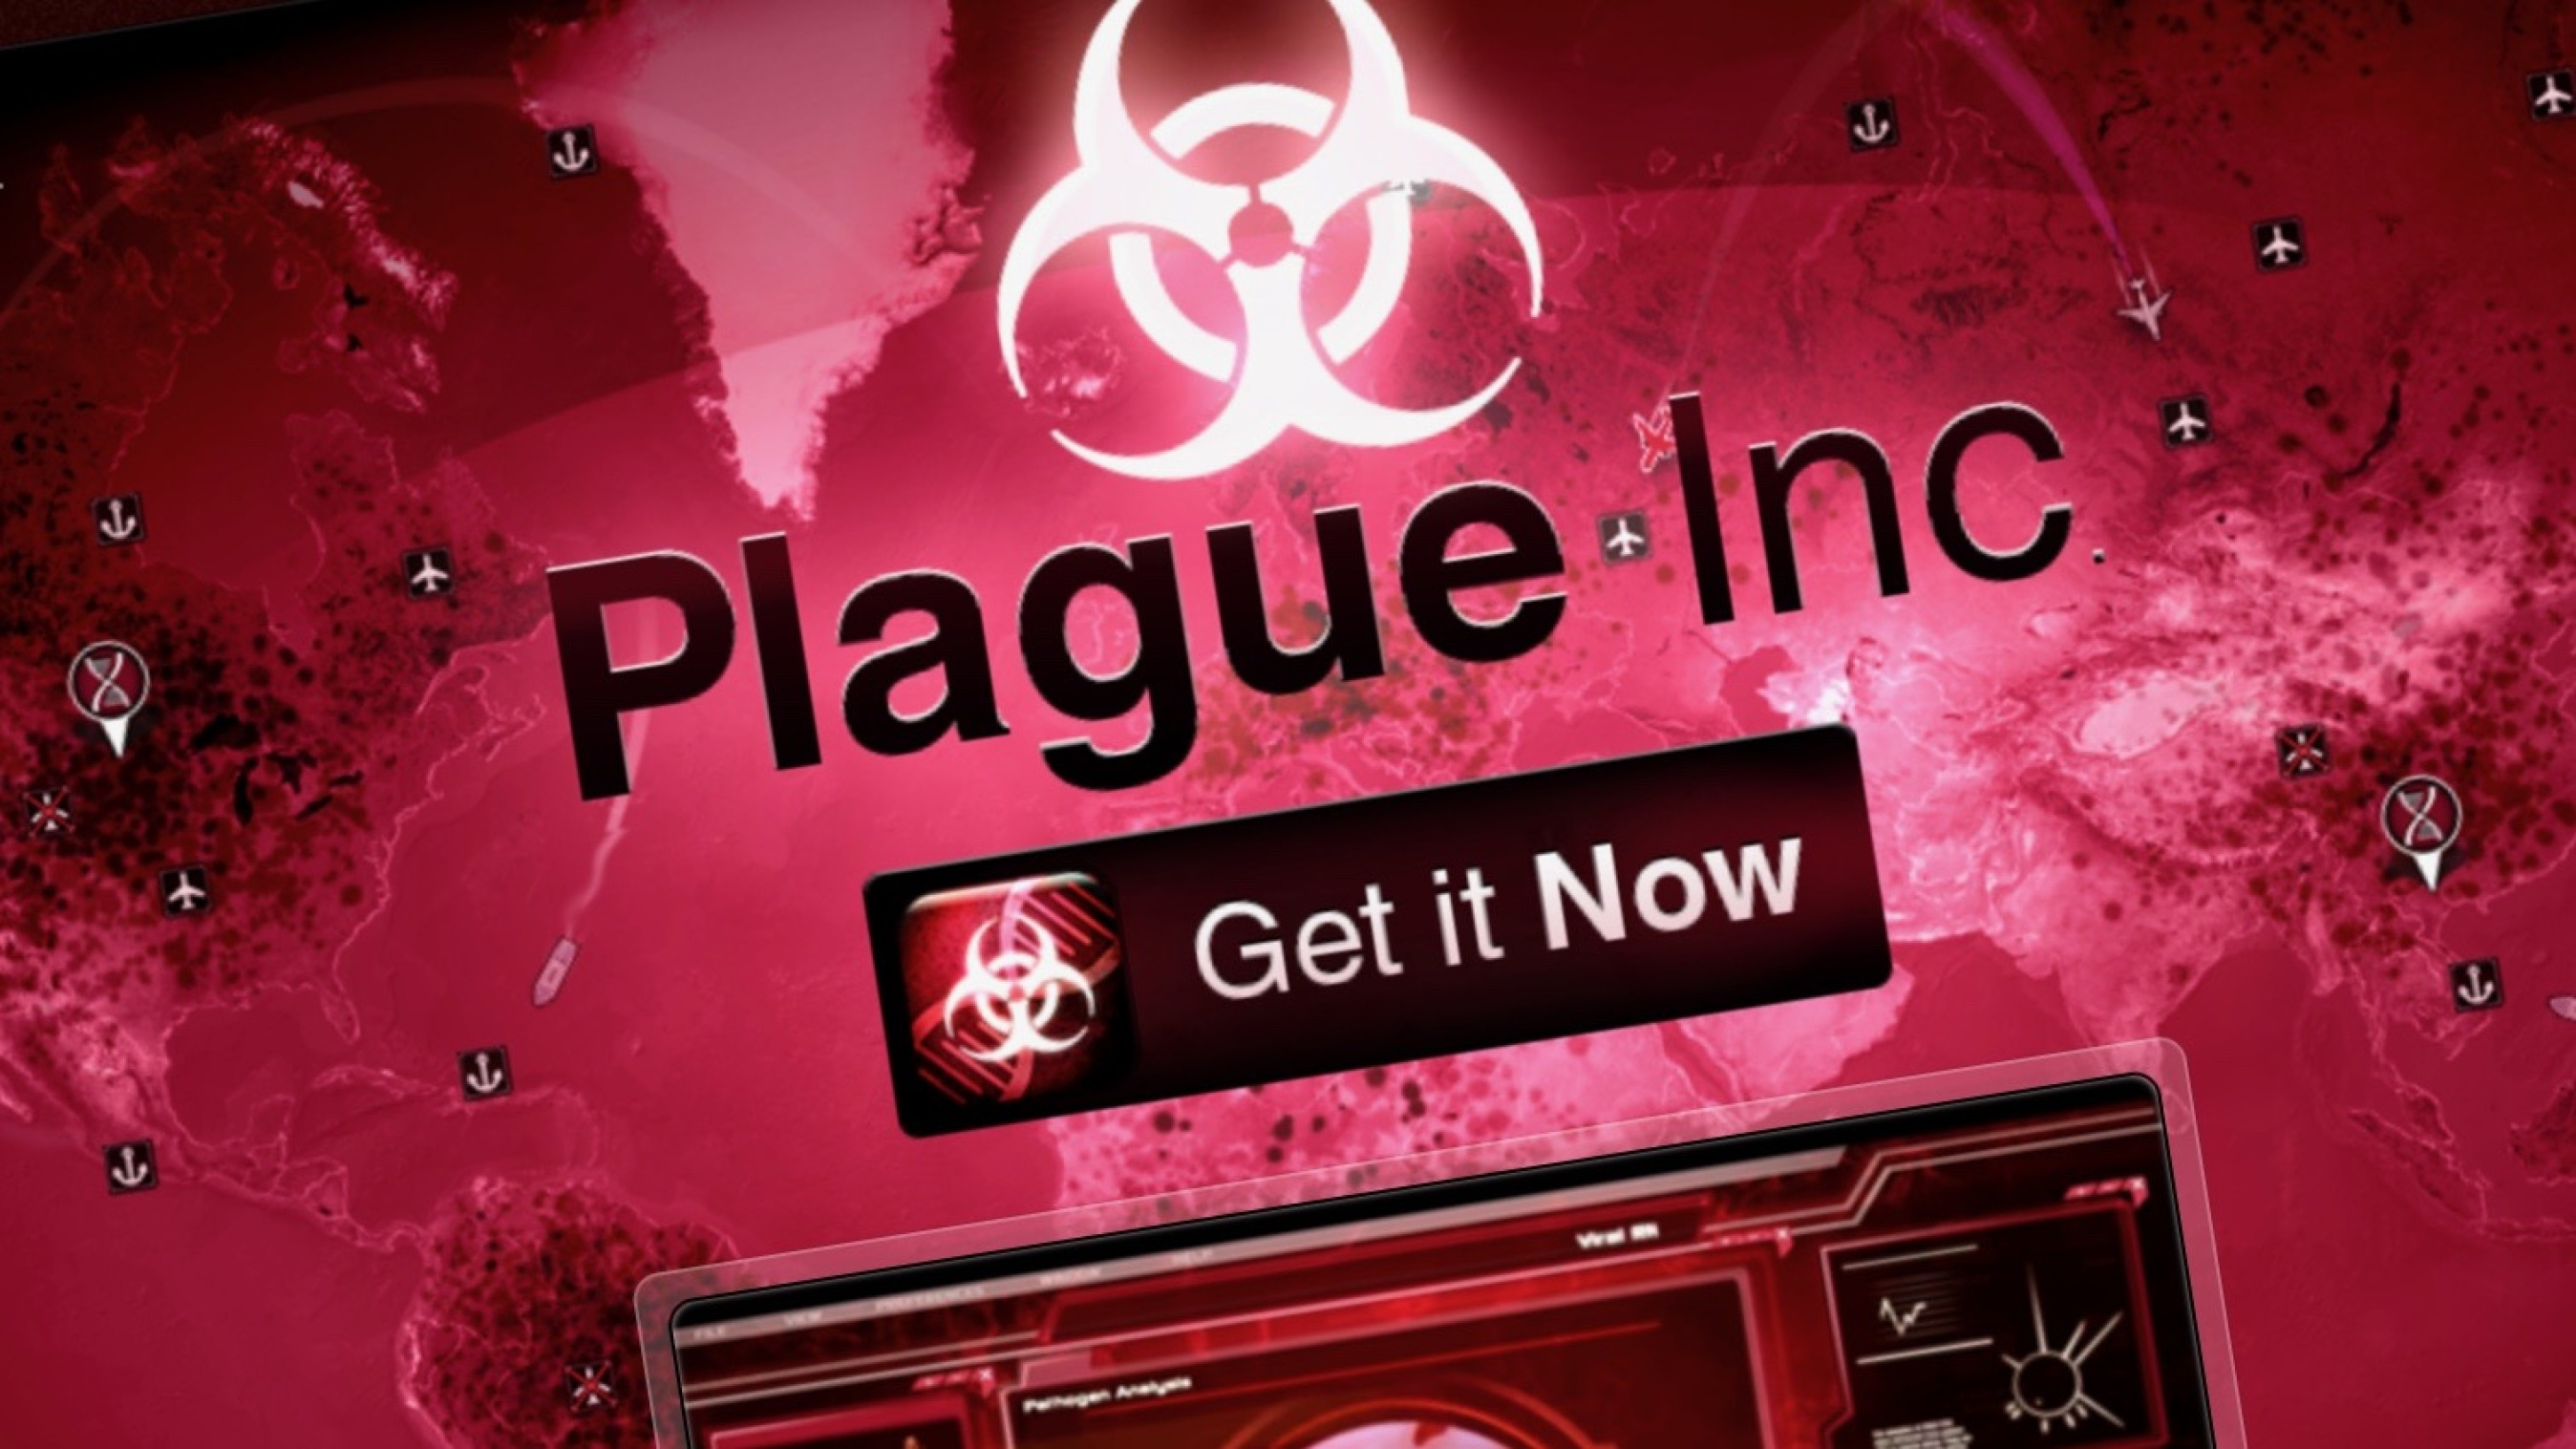 China Removes Plague Inc. Game Amid Coronavirus Outbreak | PCMag